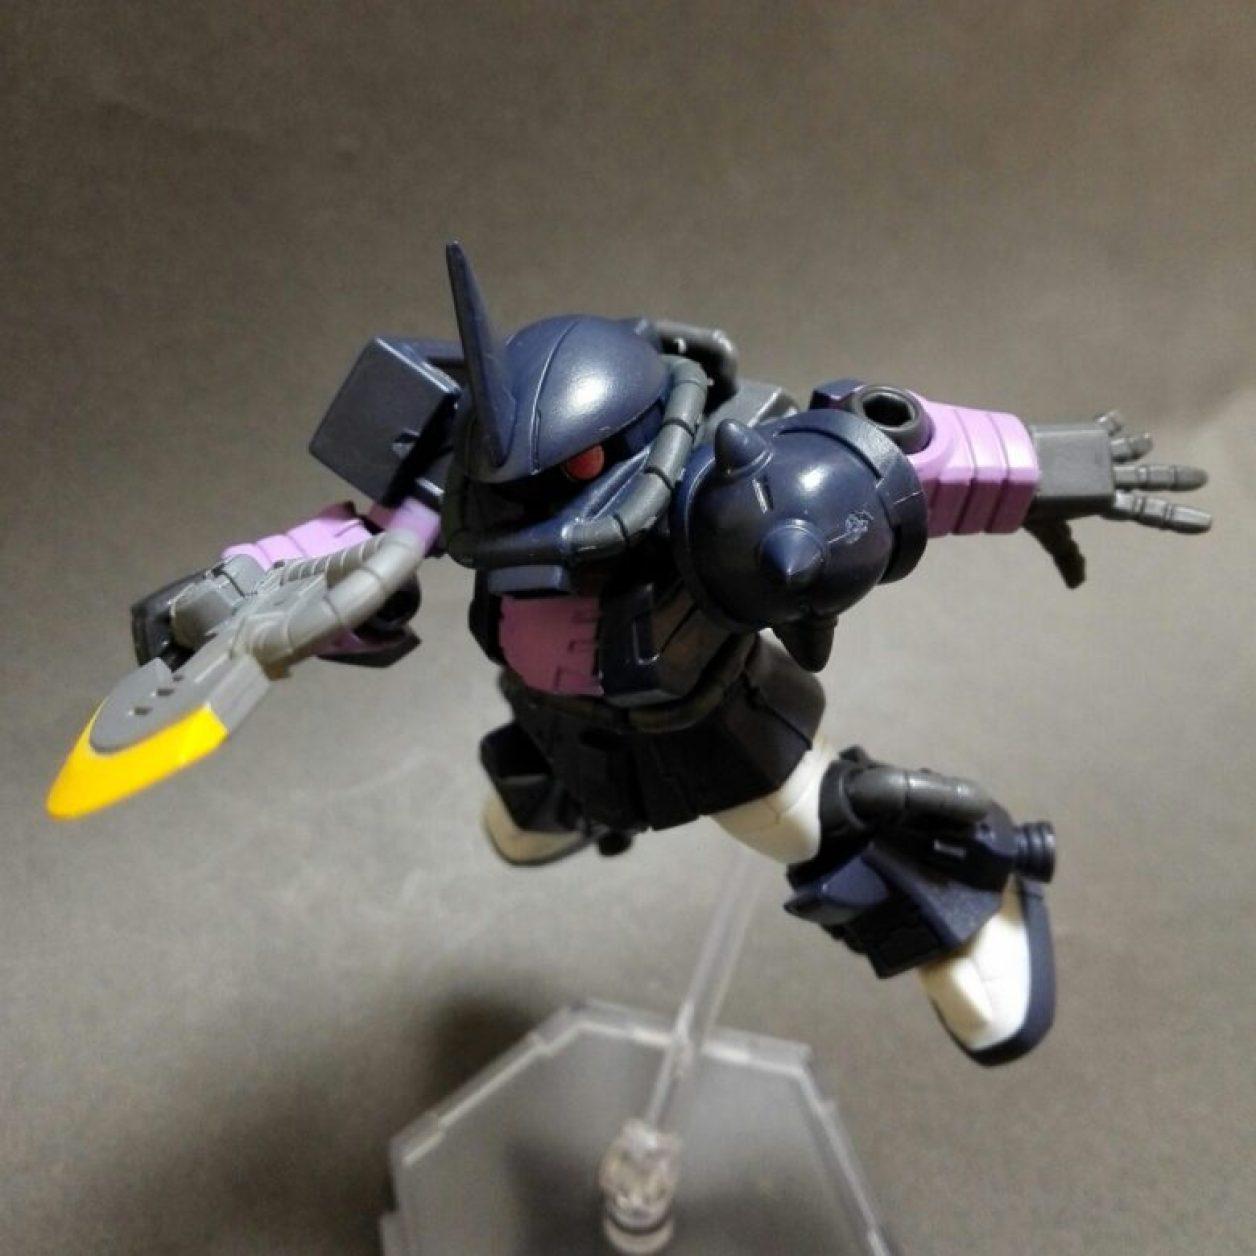 MOBILE SUIT ENSEMBLE(モビルスーツアンサンブル)12弾の高機動型ザクii(黒い三連星仕様)にヒートホークを装備させた画像